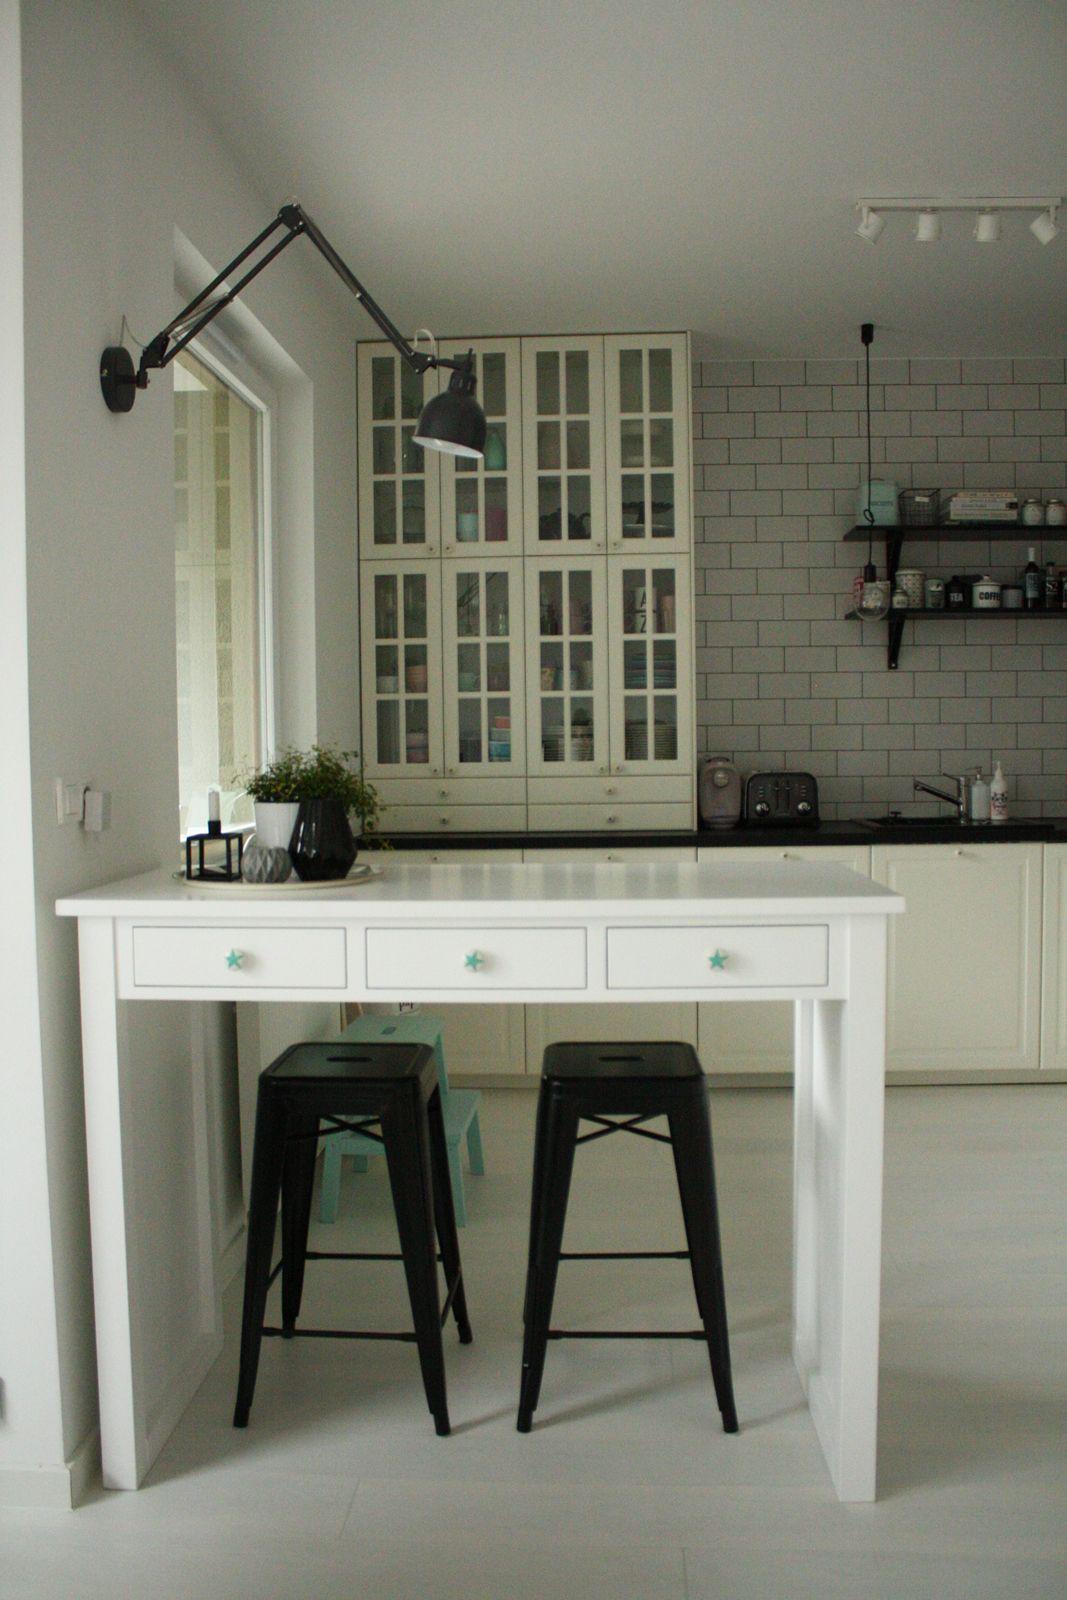 Stolik Barowy Home Decor Home Kitchen